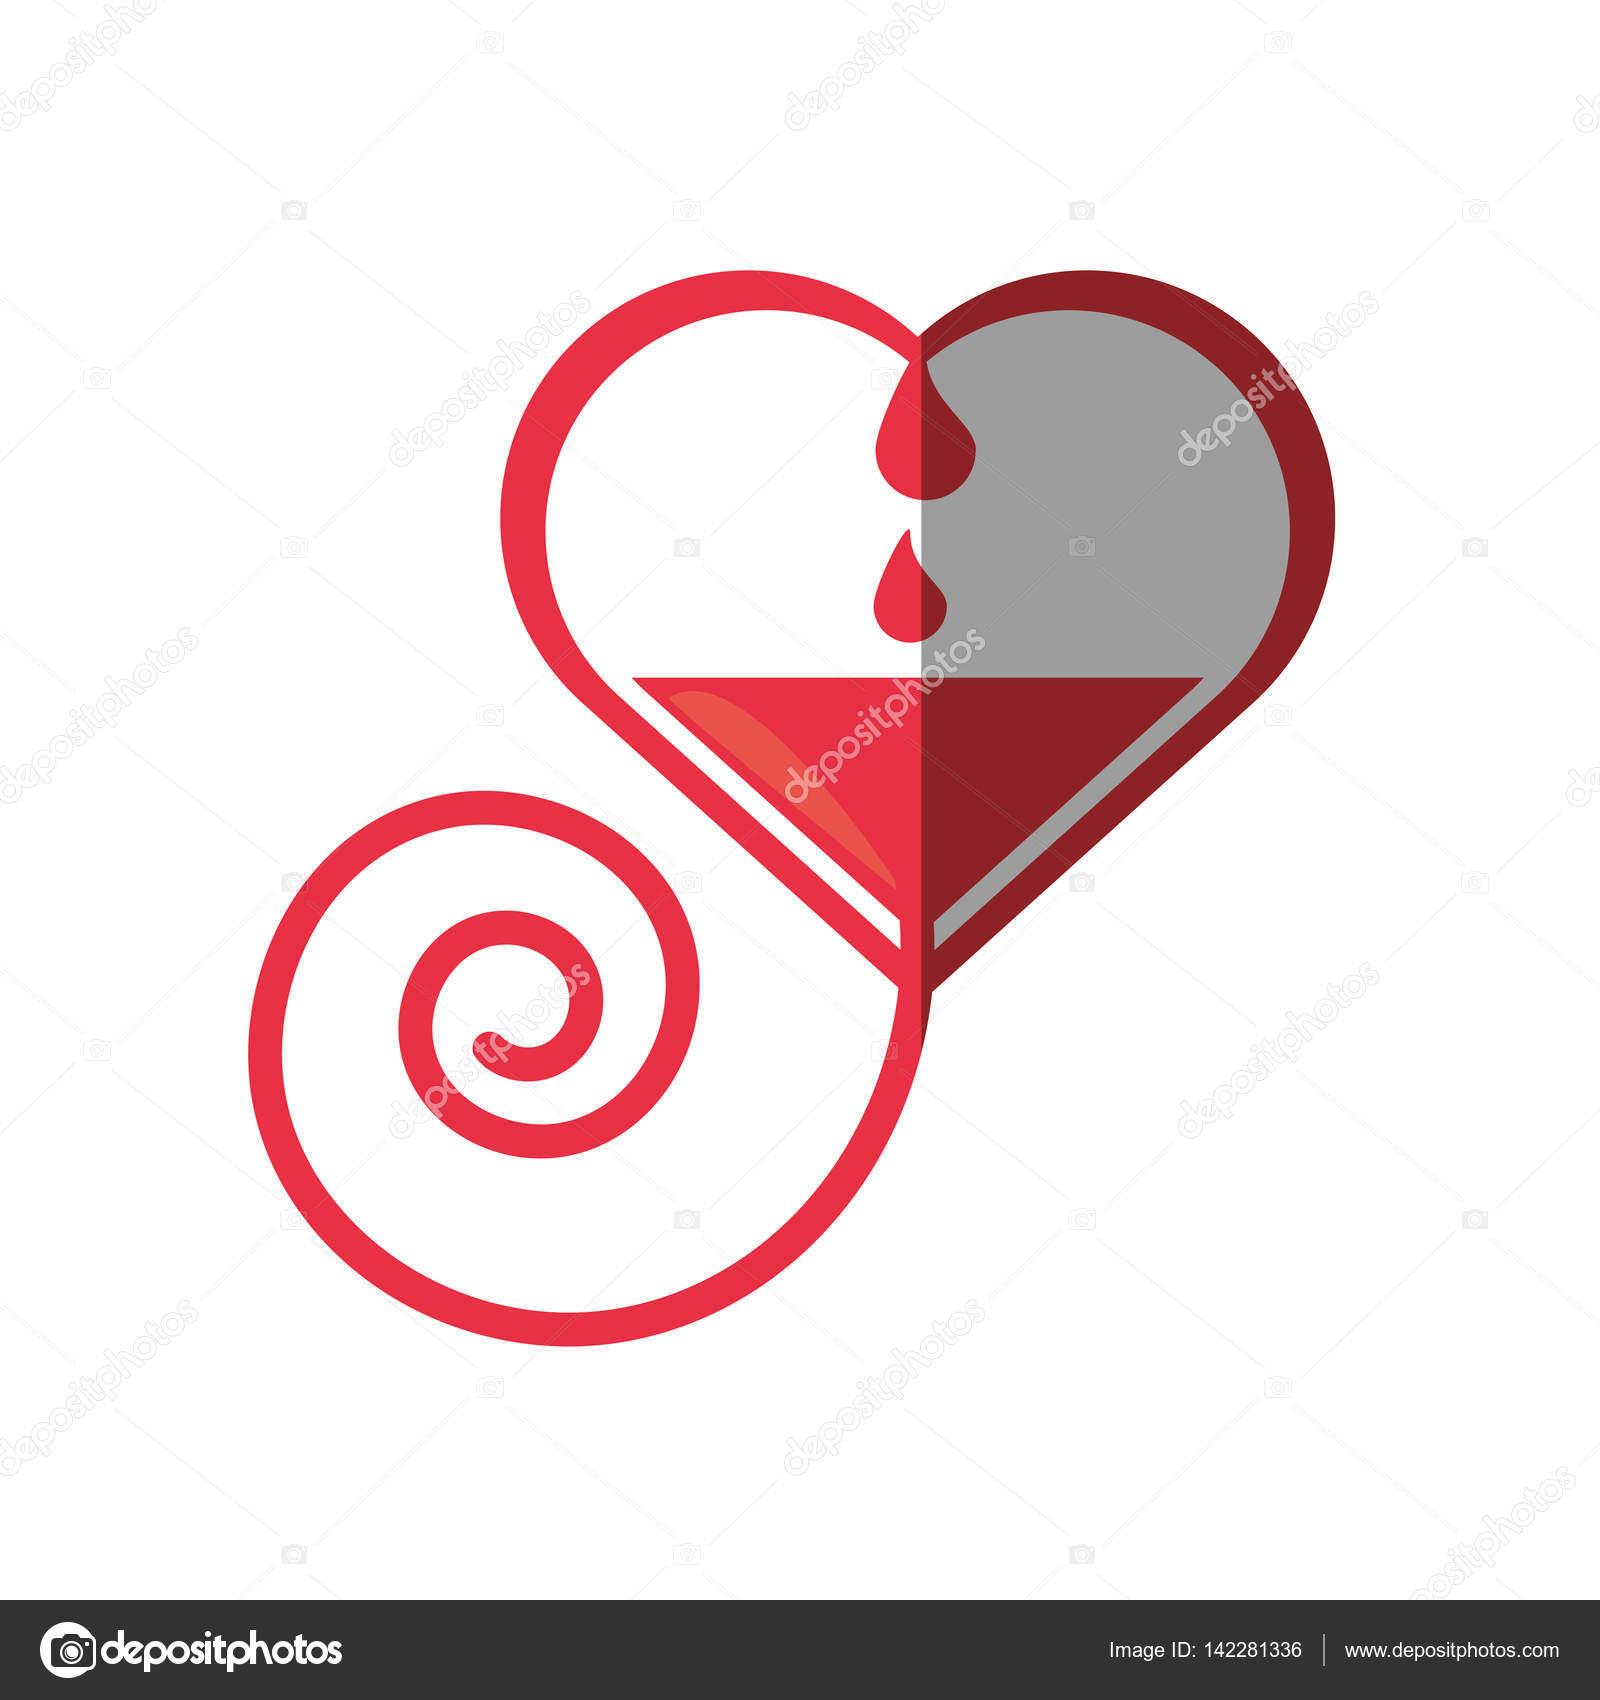 Heart blood donation symbol stock vector djv 142281336 heart blood donation symbol stock vector buycottarizona